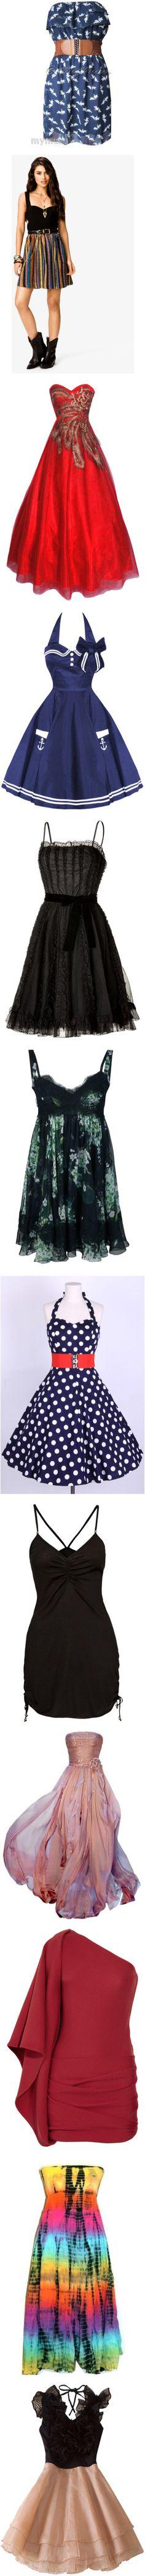 """Dresses"" by christina-m-k on Polyvore"